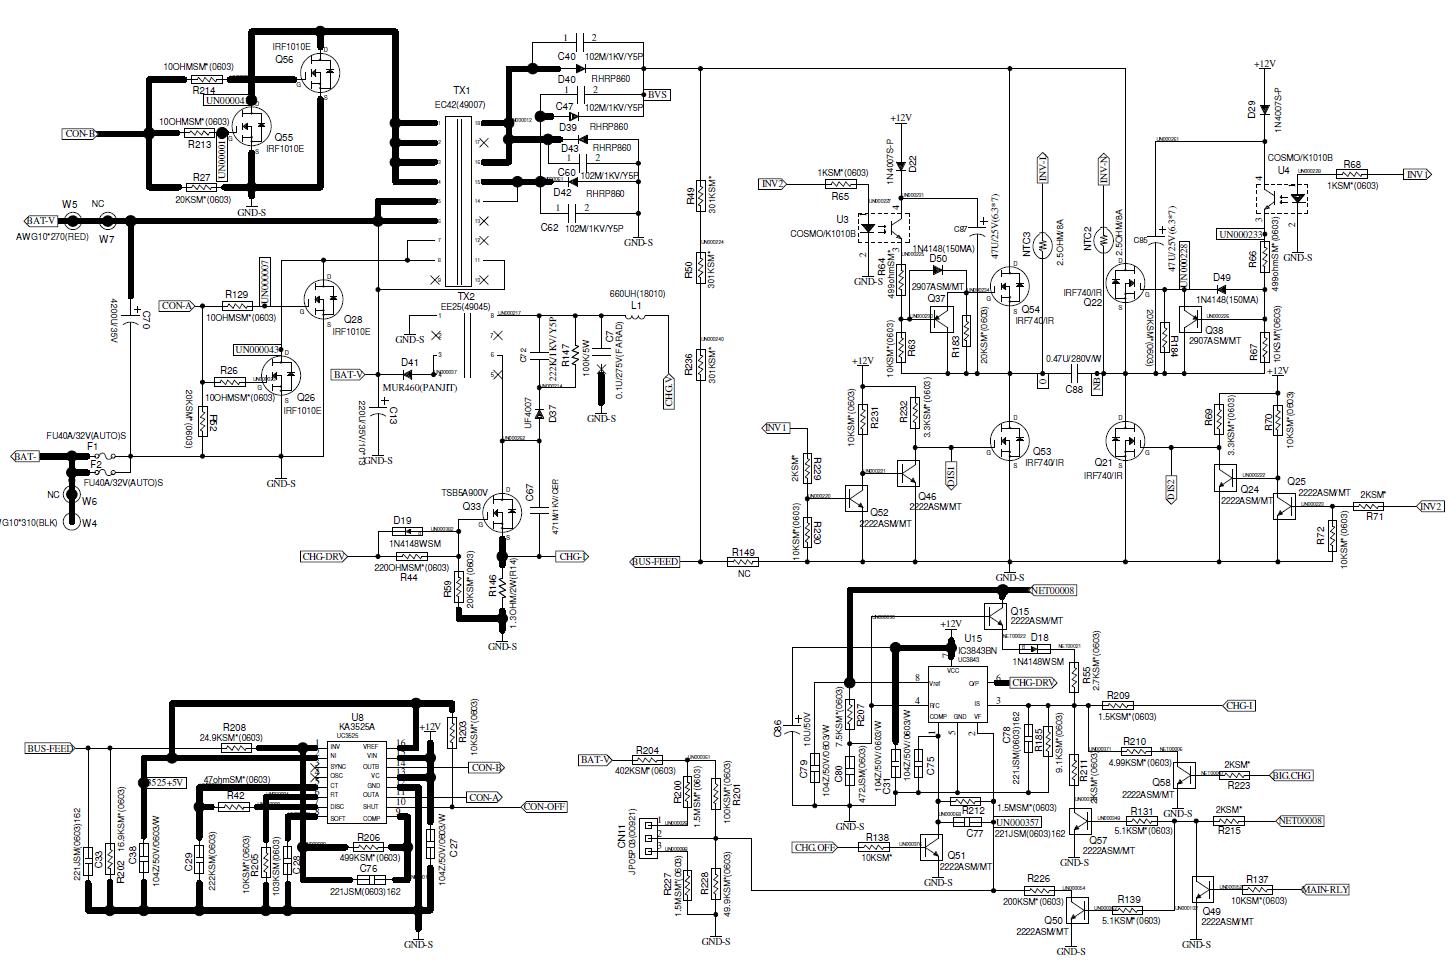 Ippon back power pro 600 инструкция схема